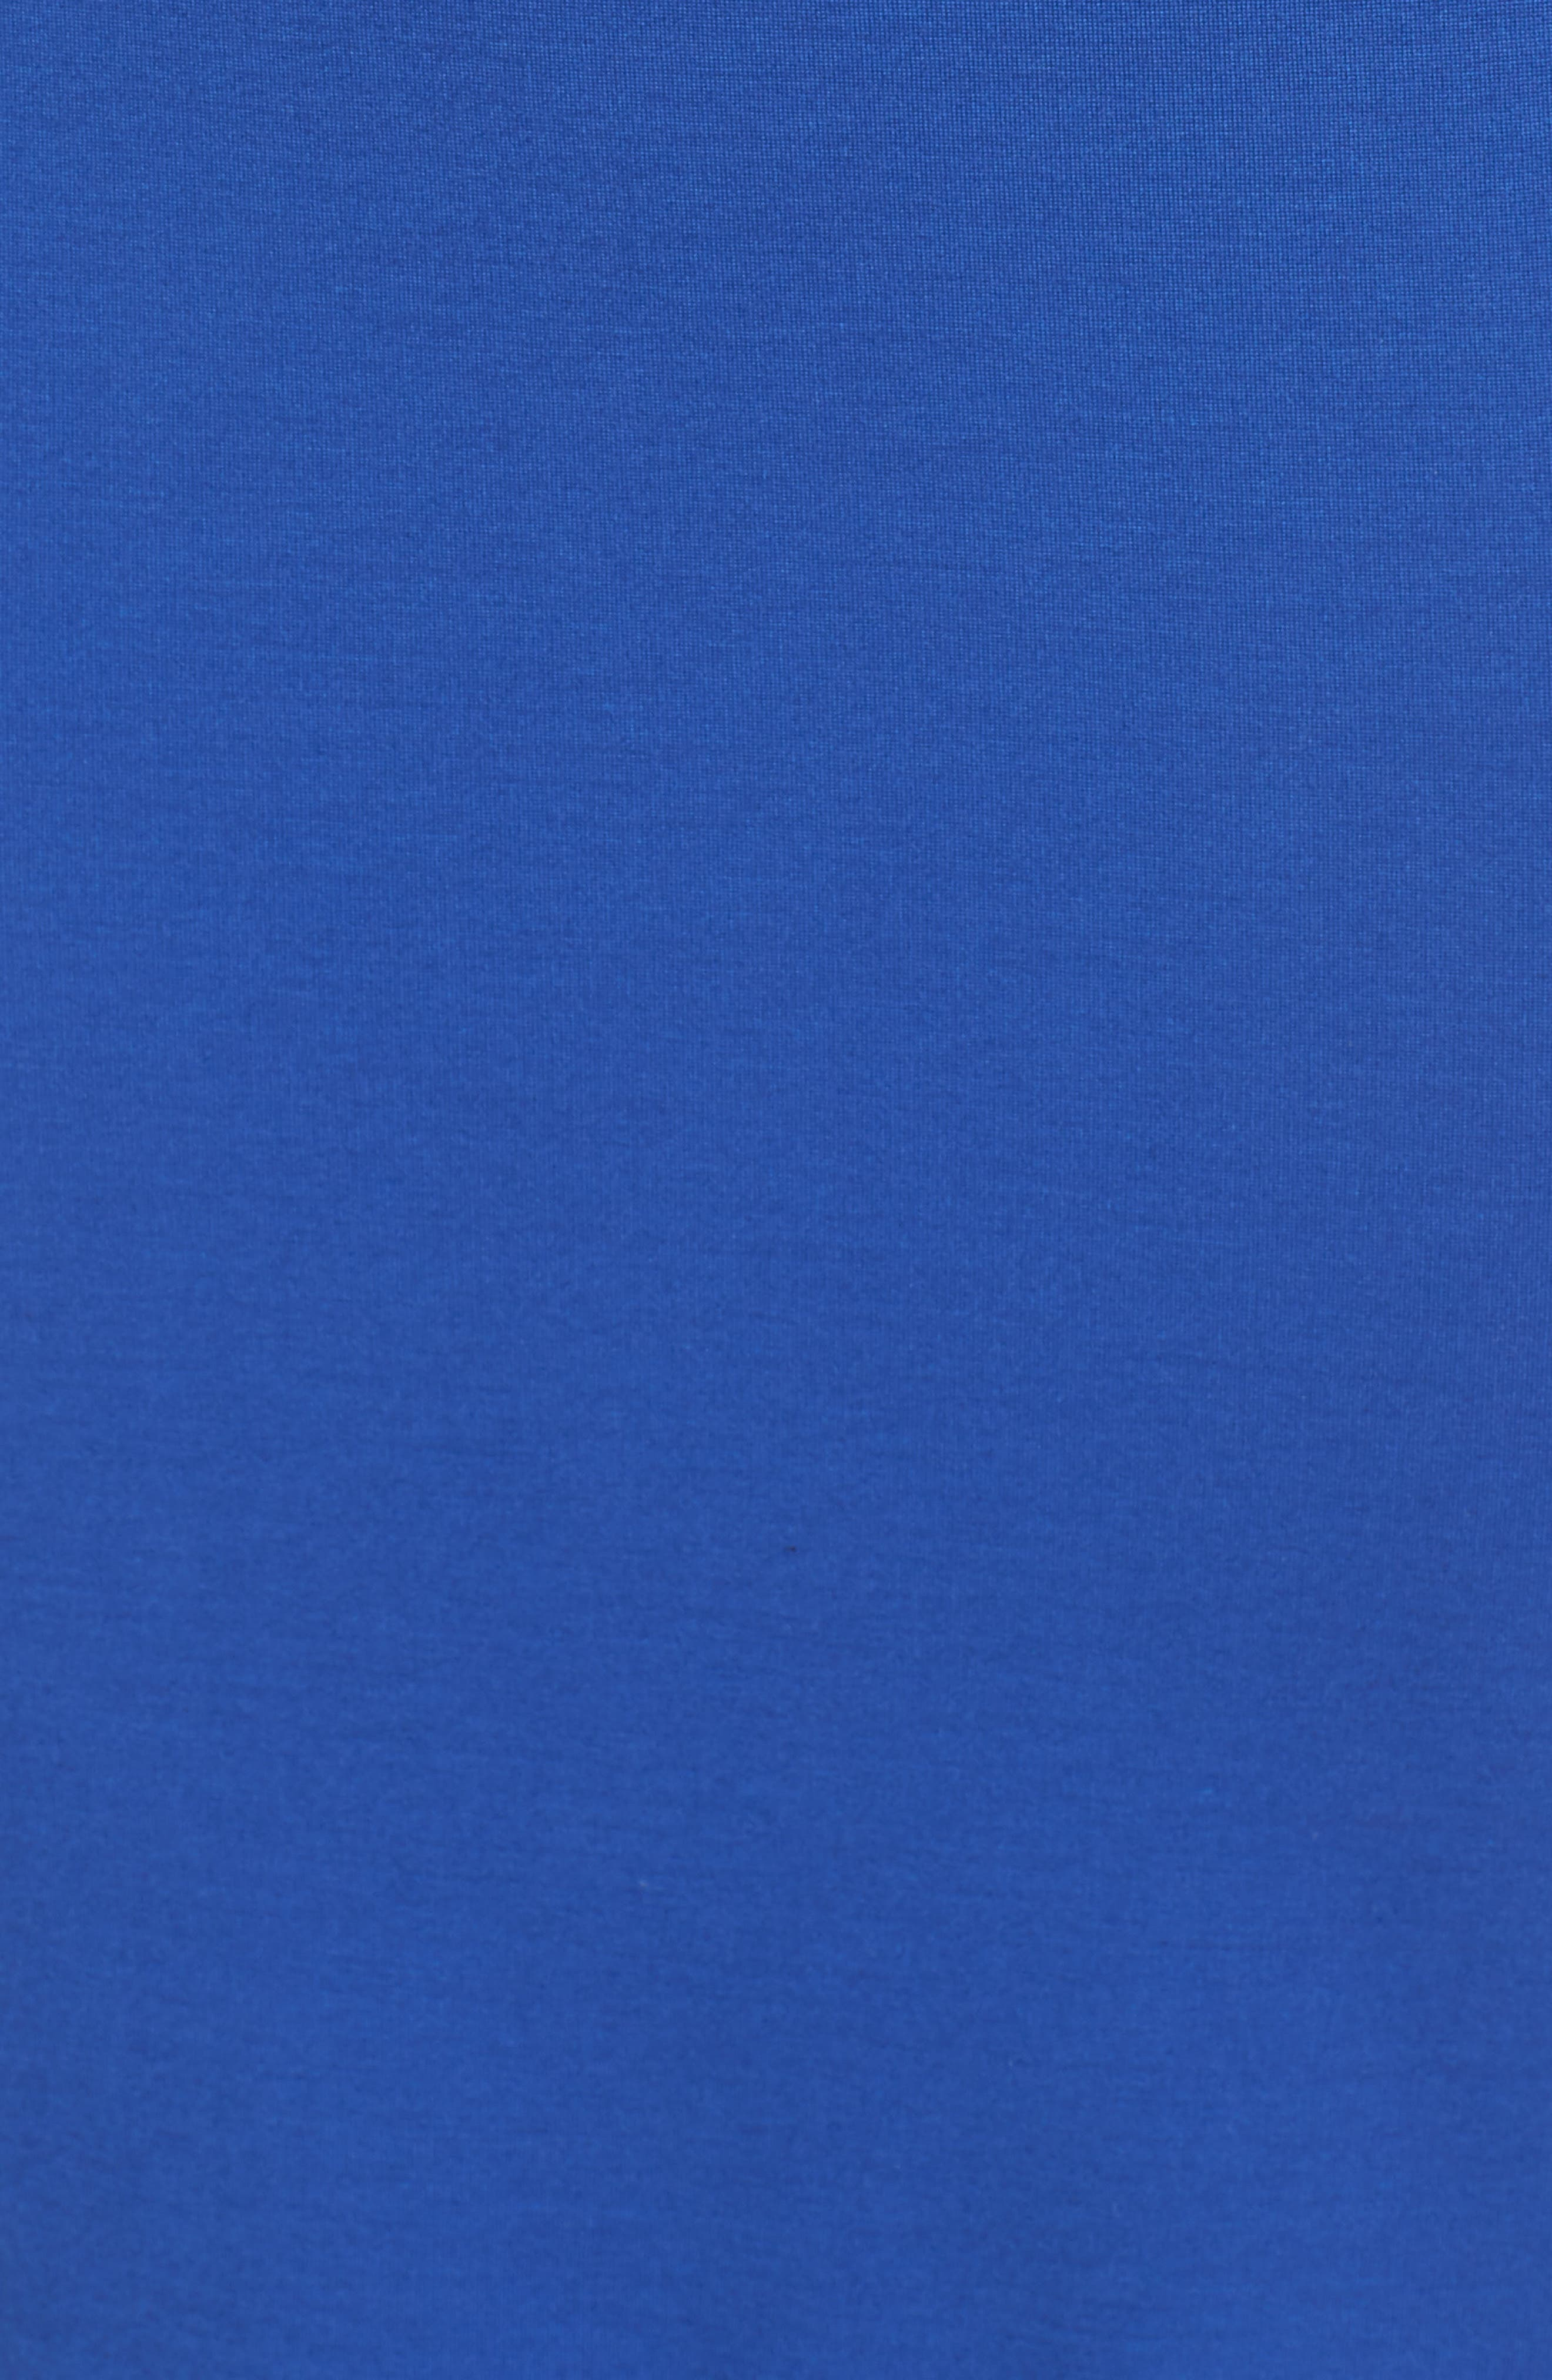 Viola Asymmetrical Dress,                             Alternate thumbnail 6, color,                             Cobalt